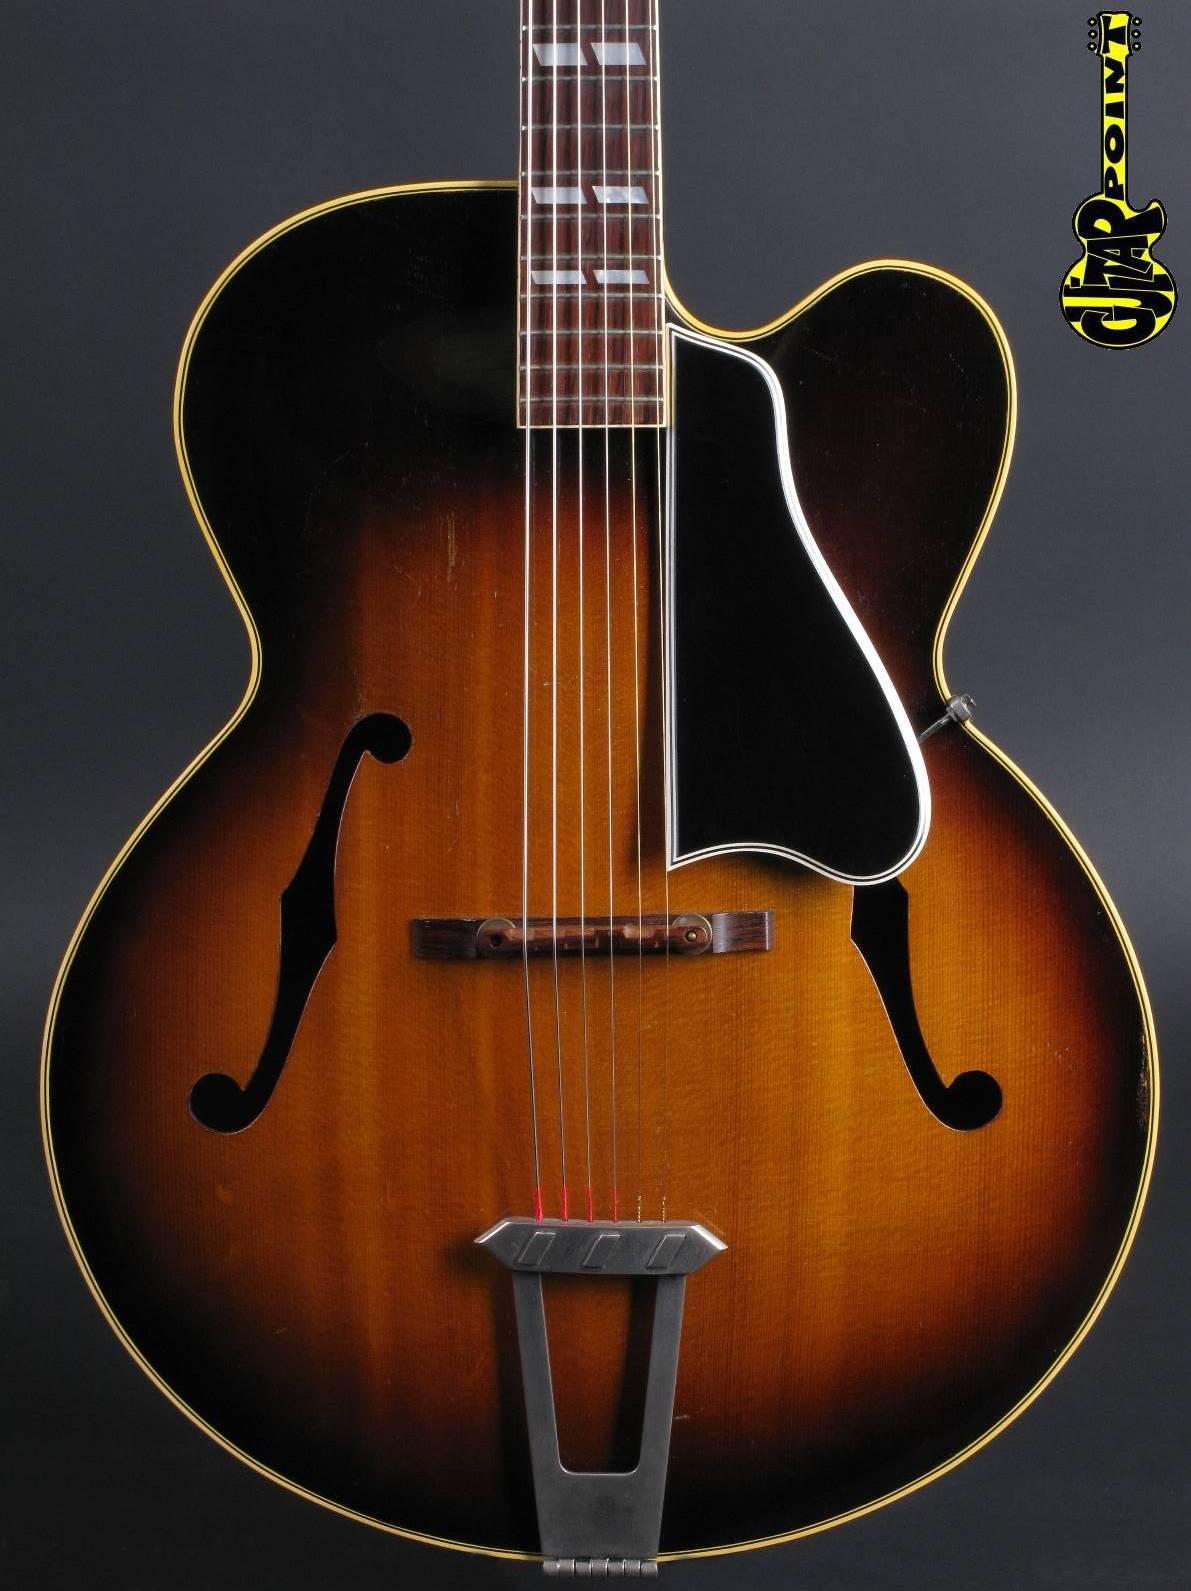 1956 Gibson L-7C - Sunburst